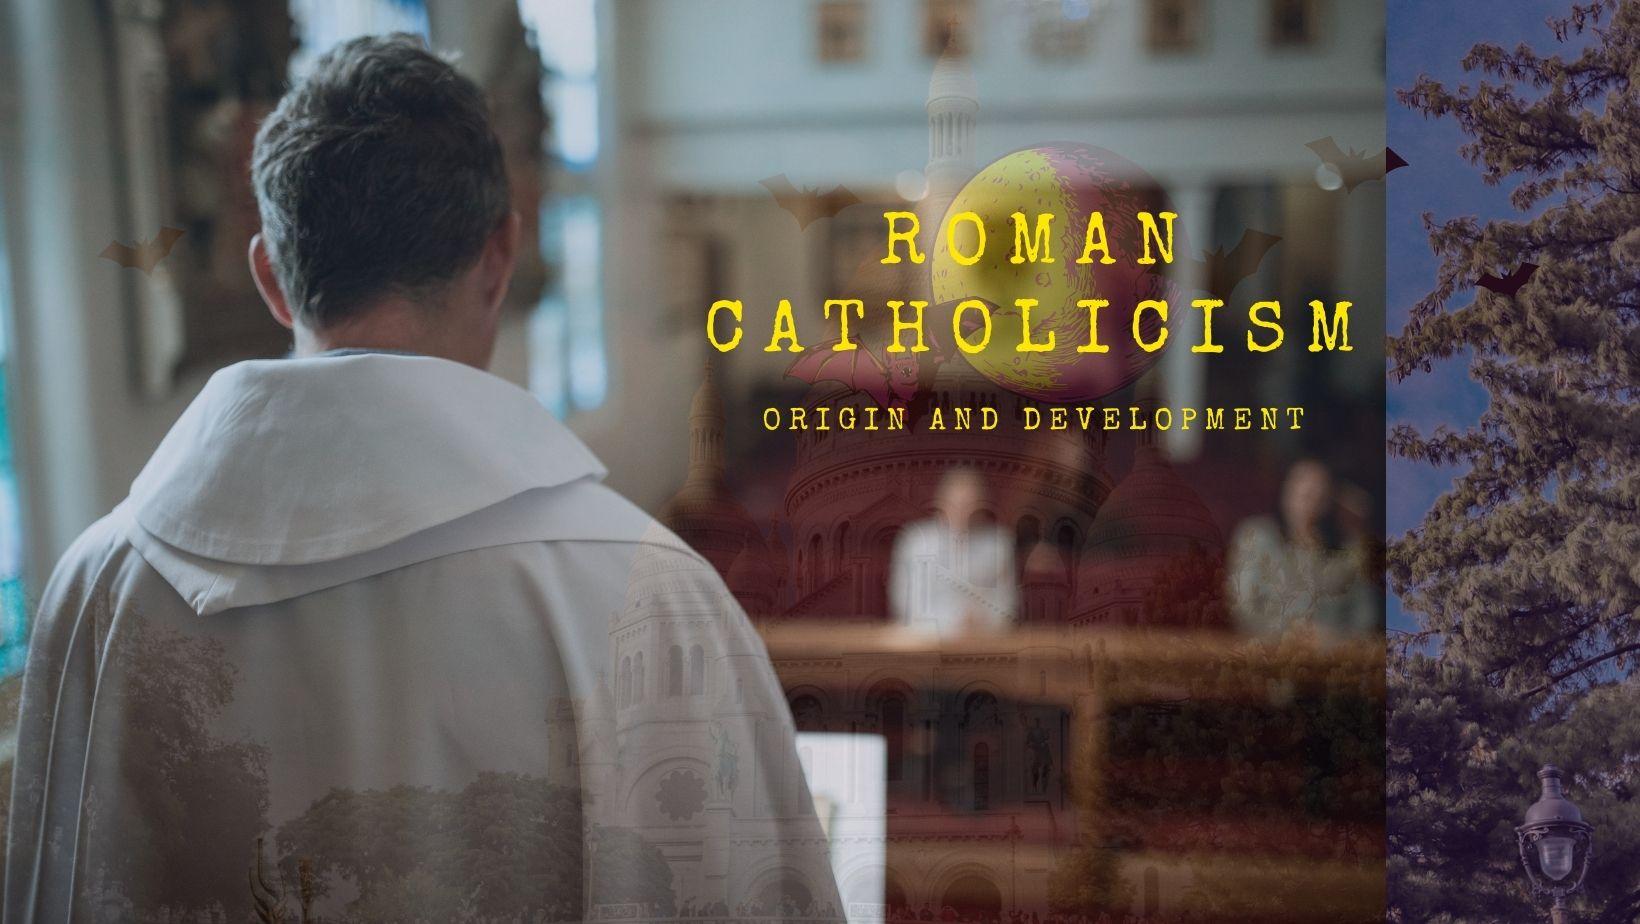 origin and development of roman catholicism